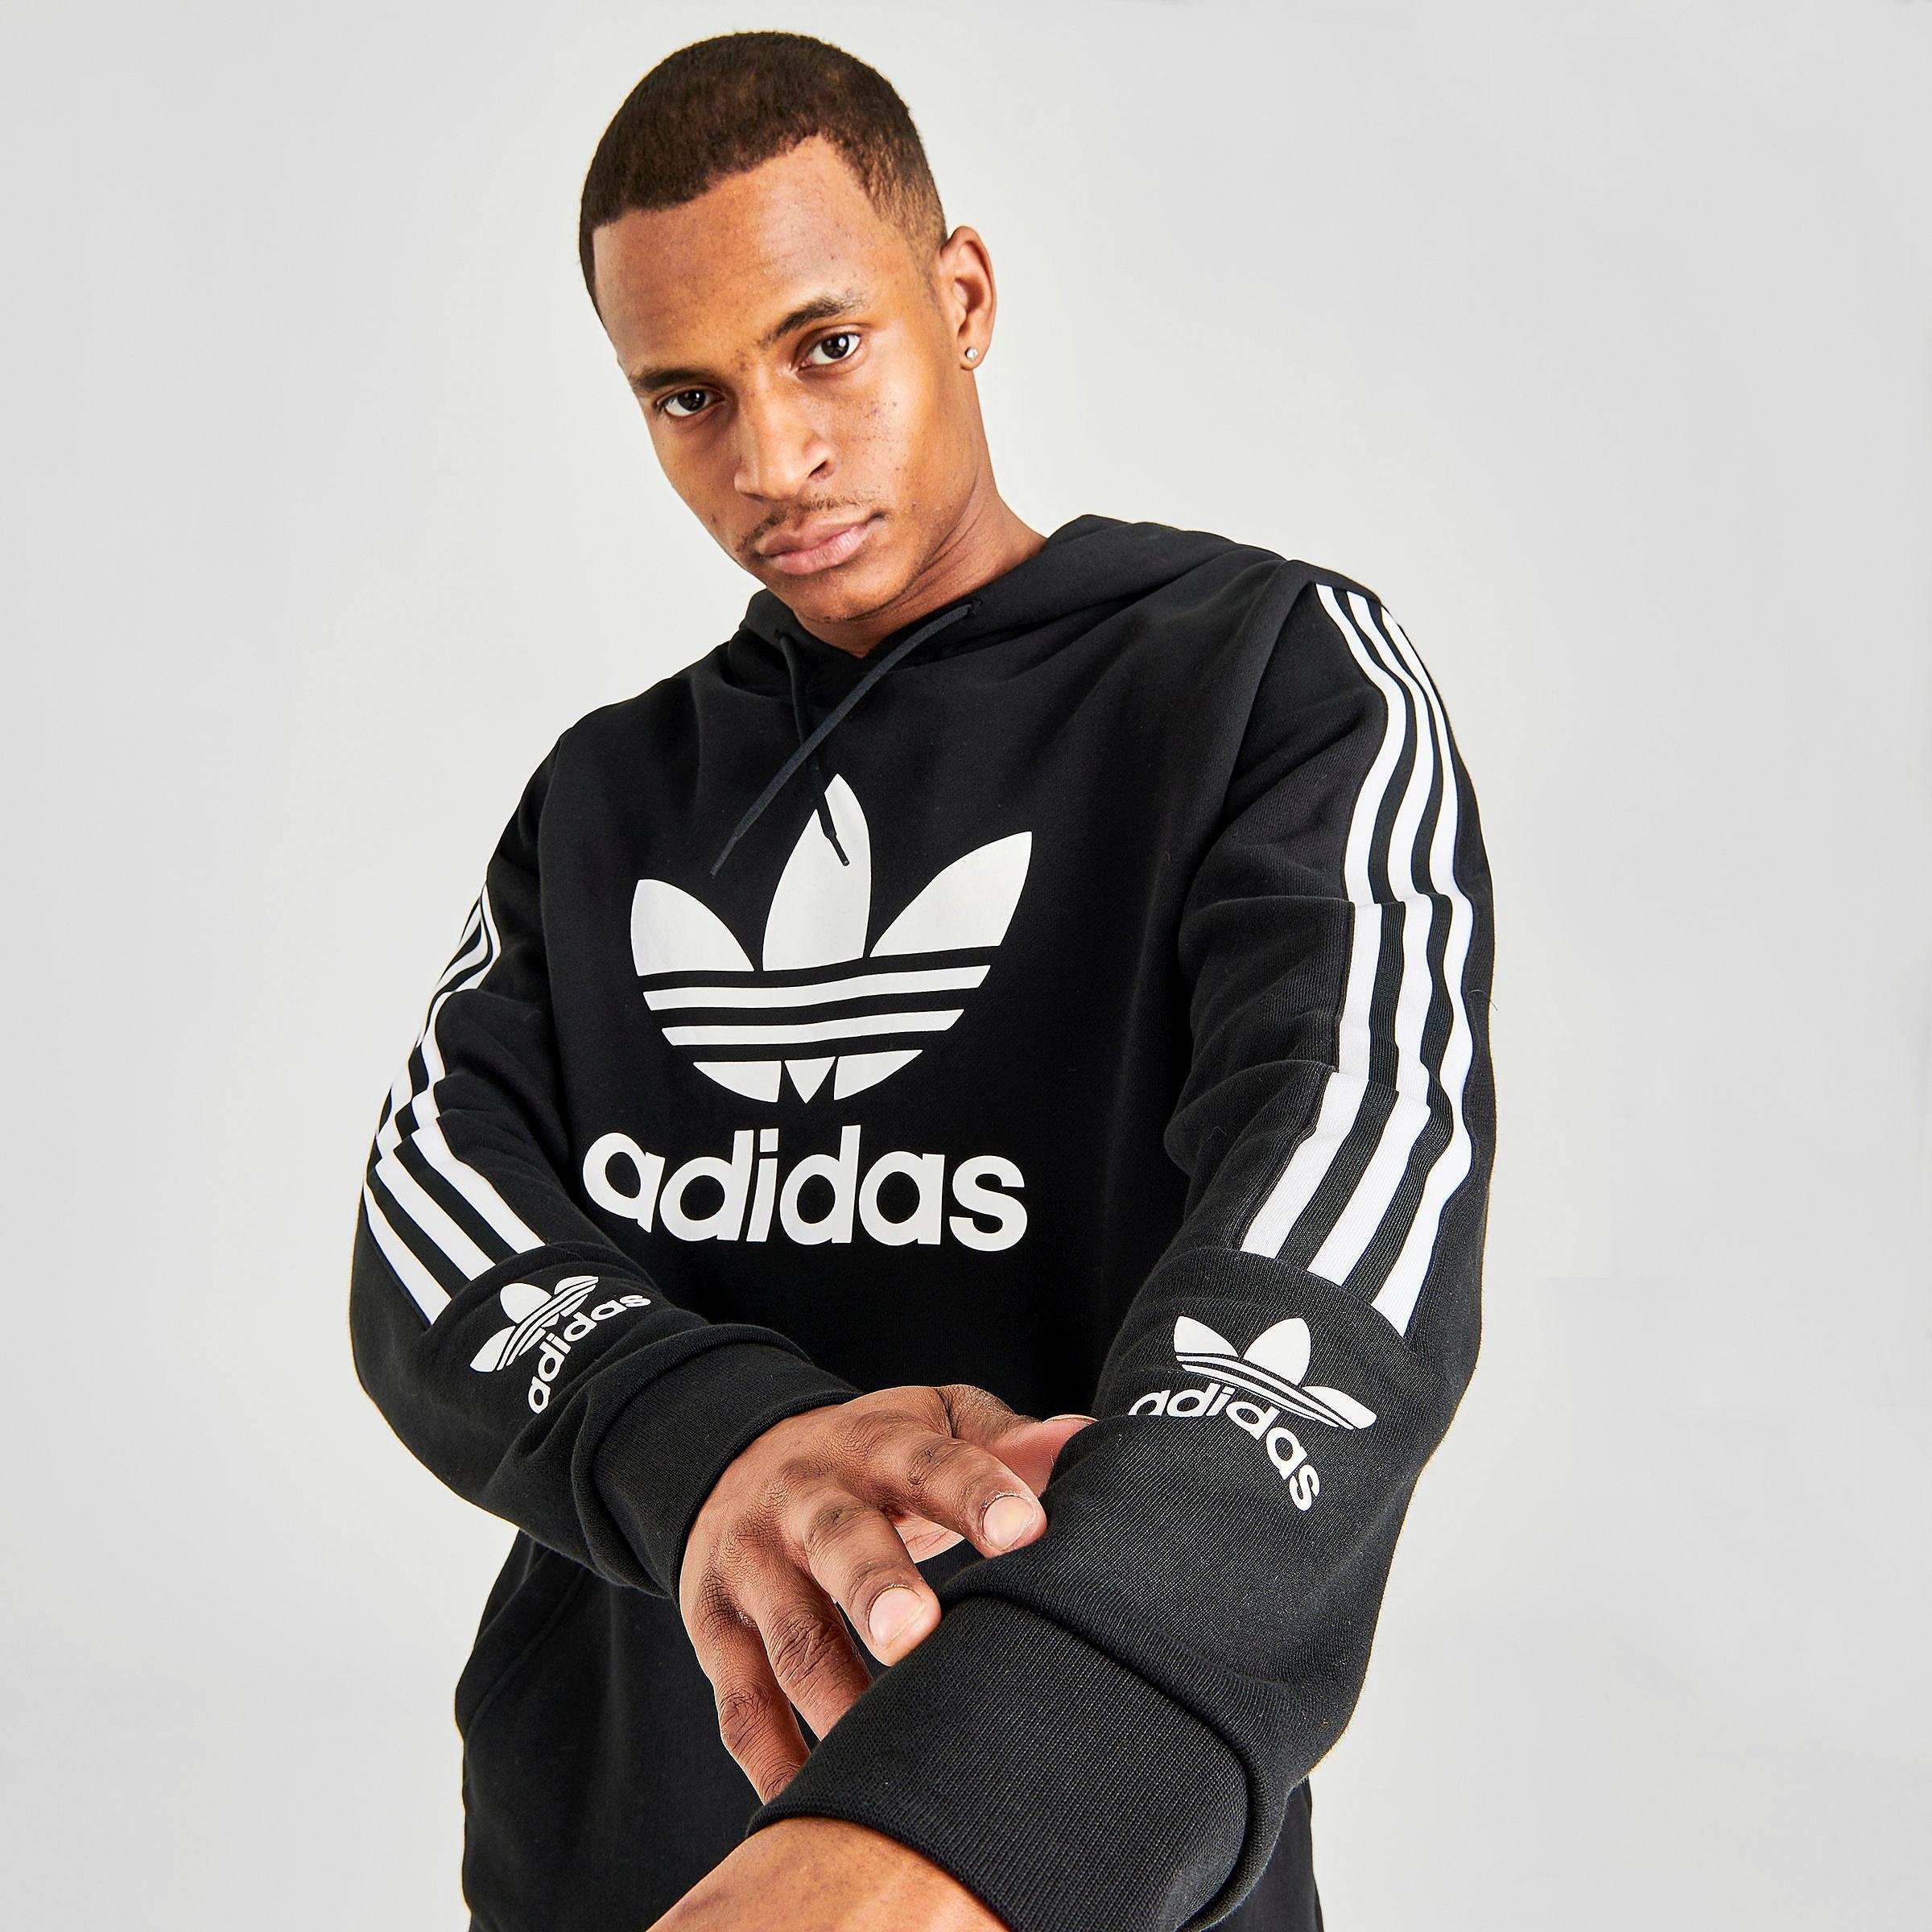 adidas ORIGINALS TREFOIL HOODIE PINK MEN'S WARM COMFY HOODED